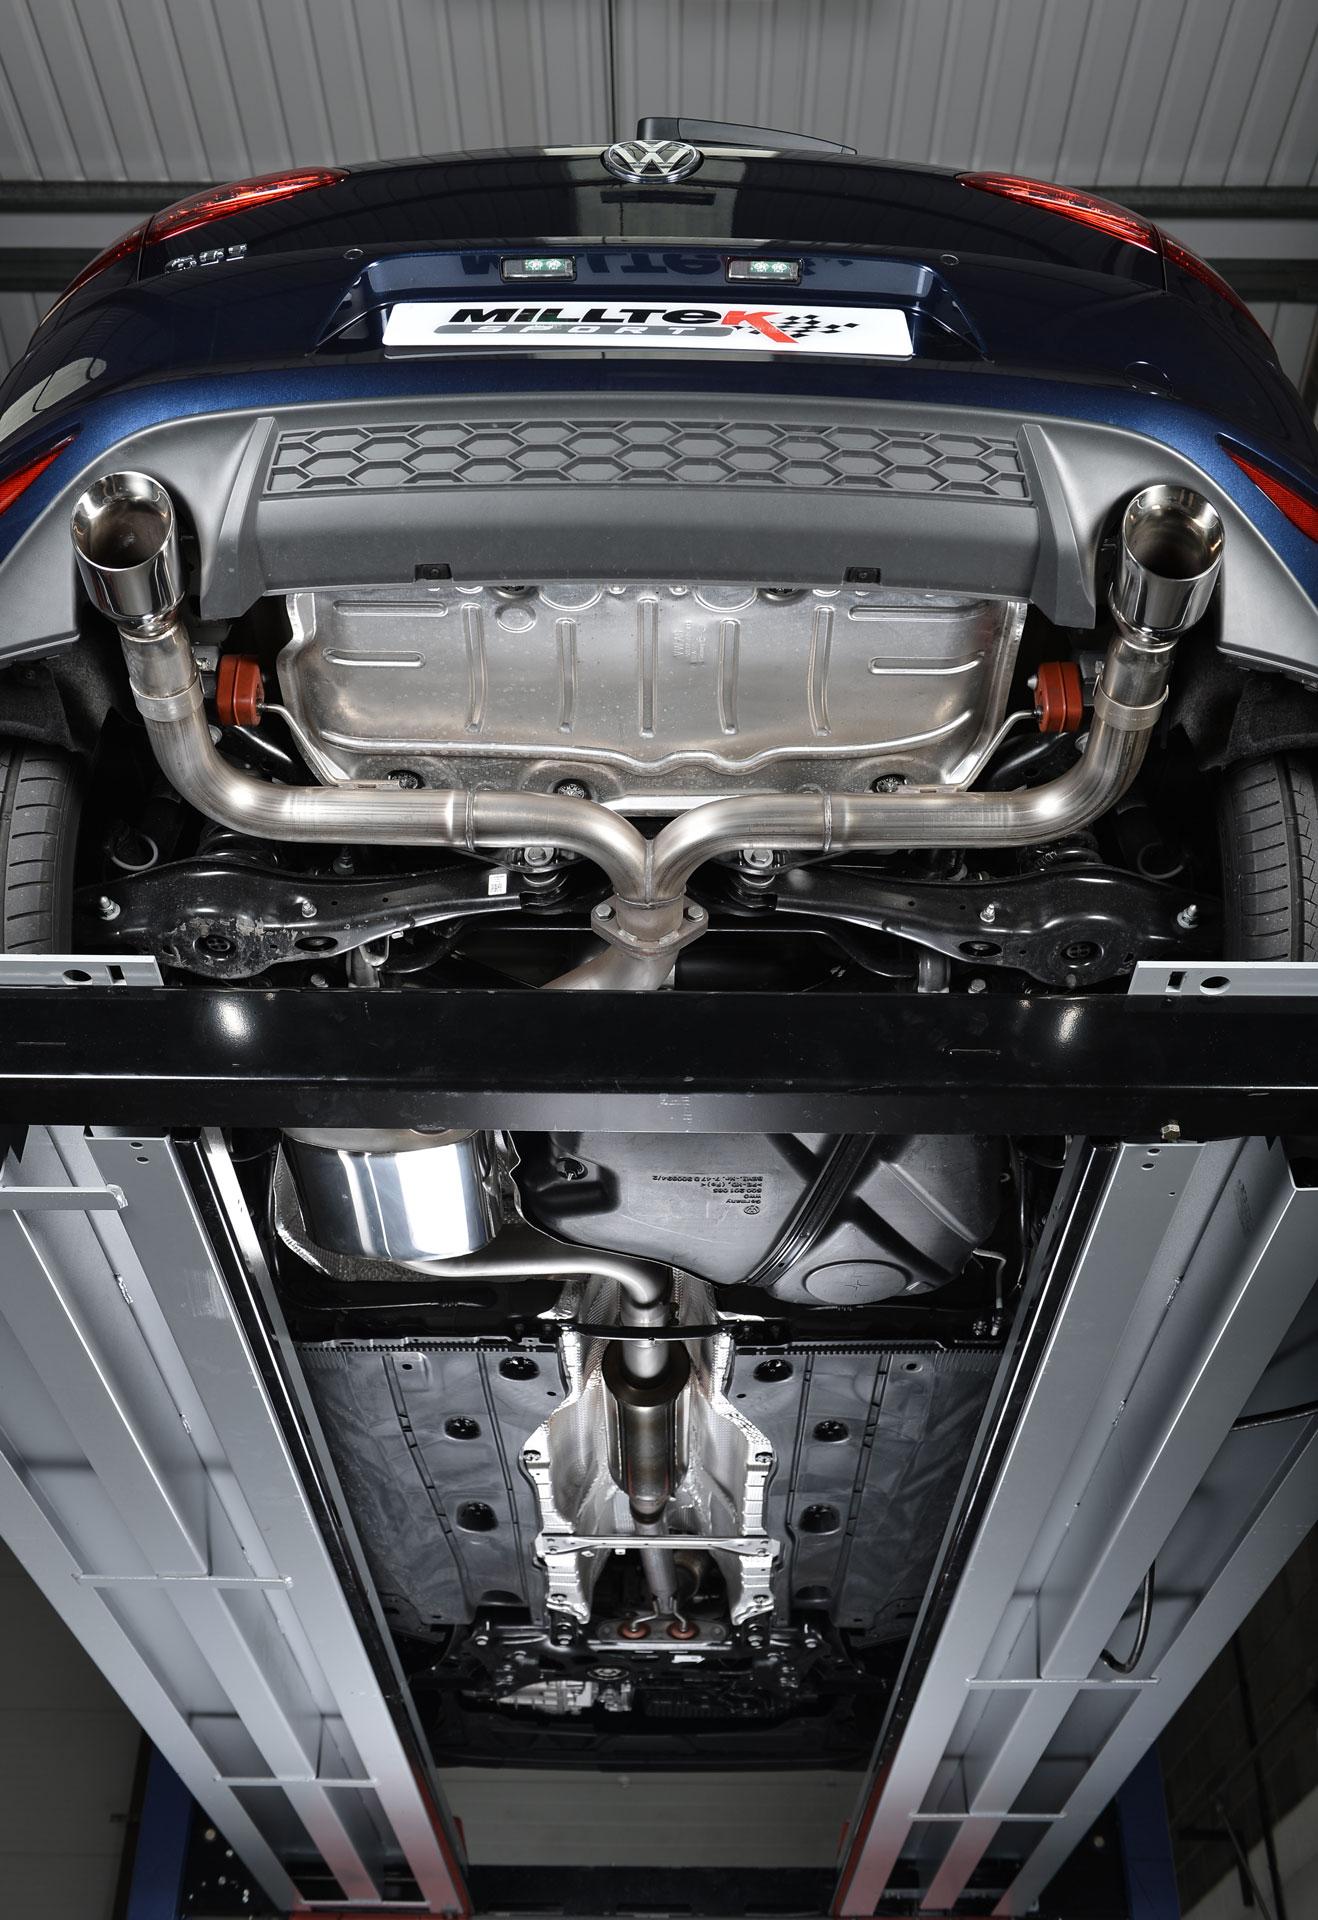 VW Golf GTi Mk7 Performance Exhaust